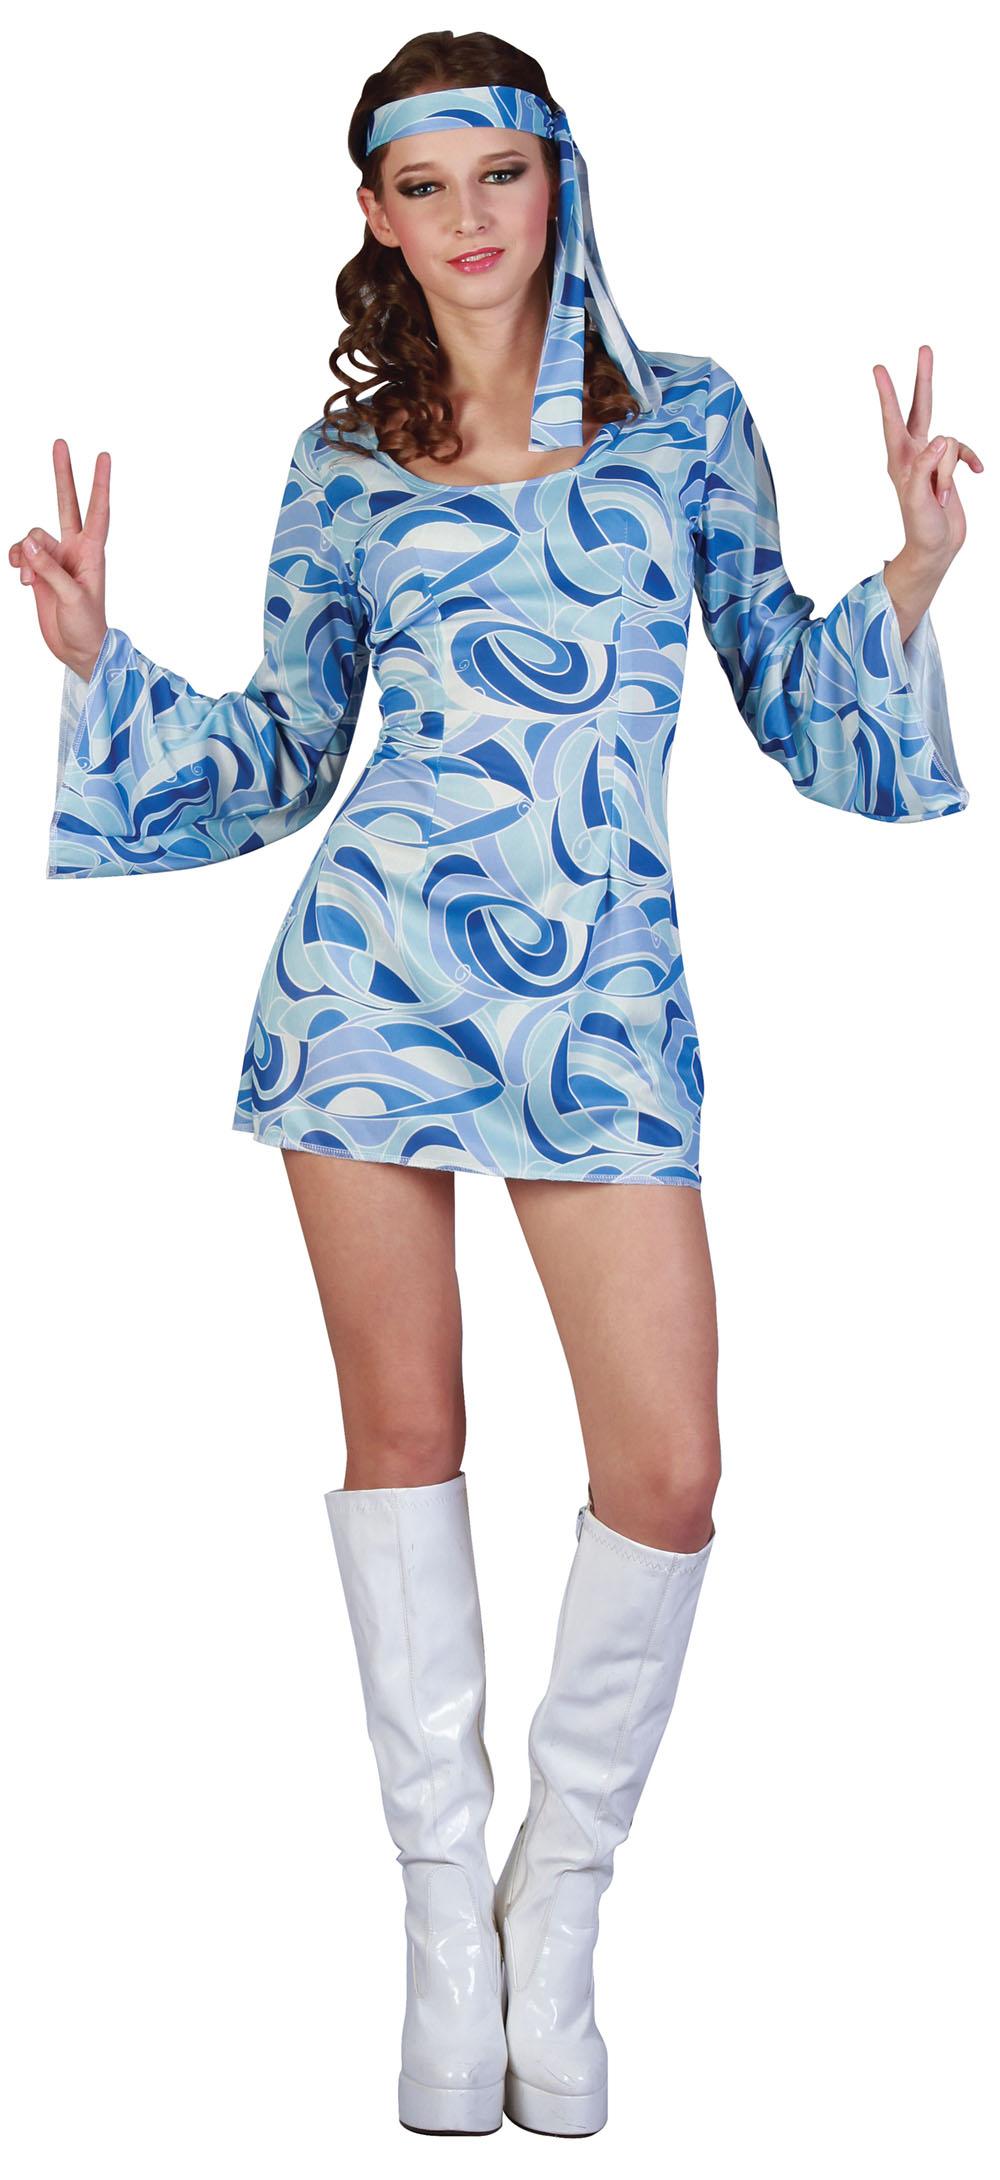 Ladies Blue Flower Power Fancy Dress Costume 70's Hippy Womens UK 10-14